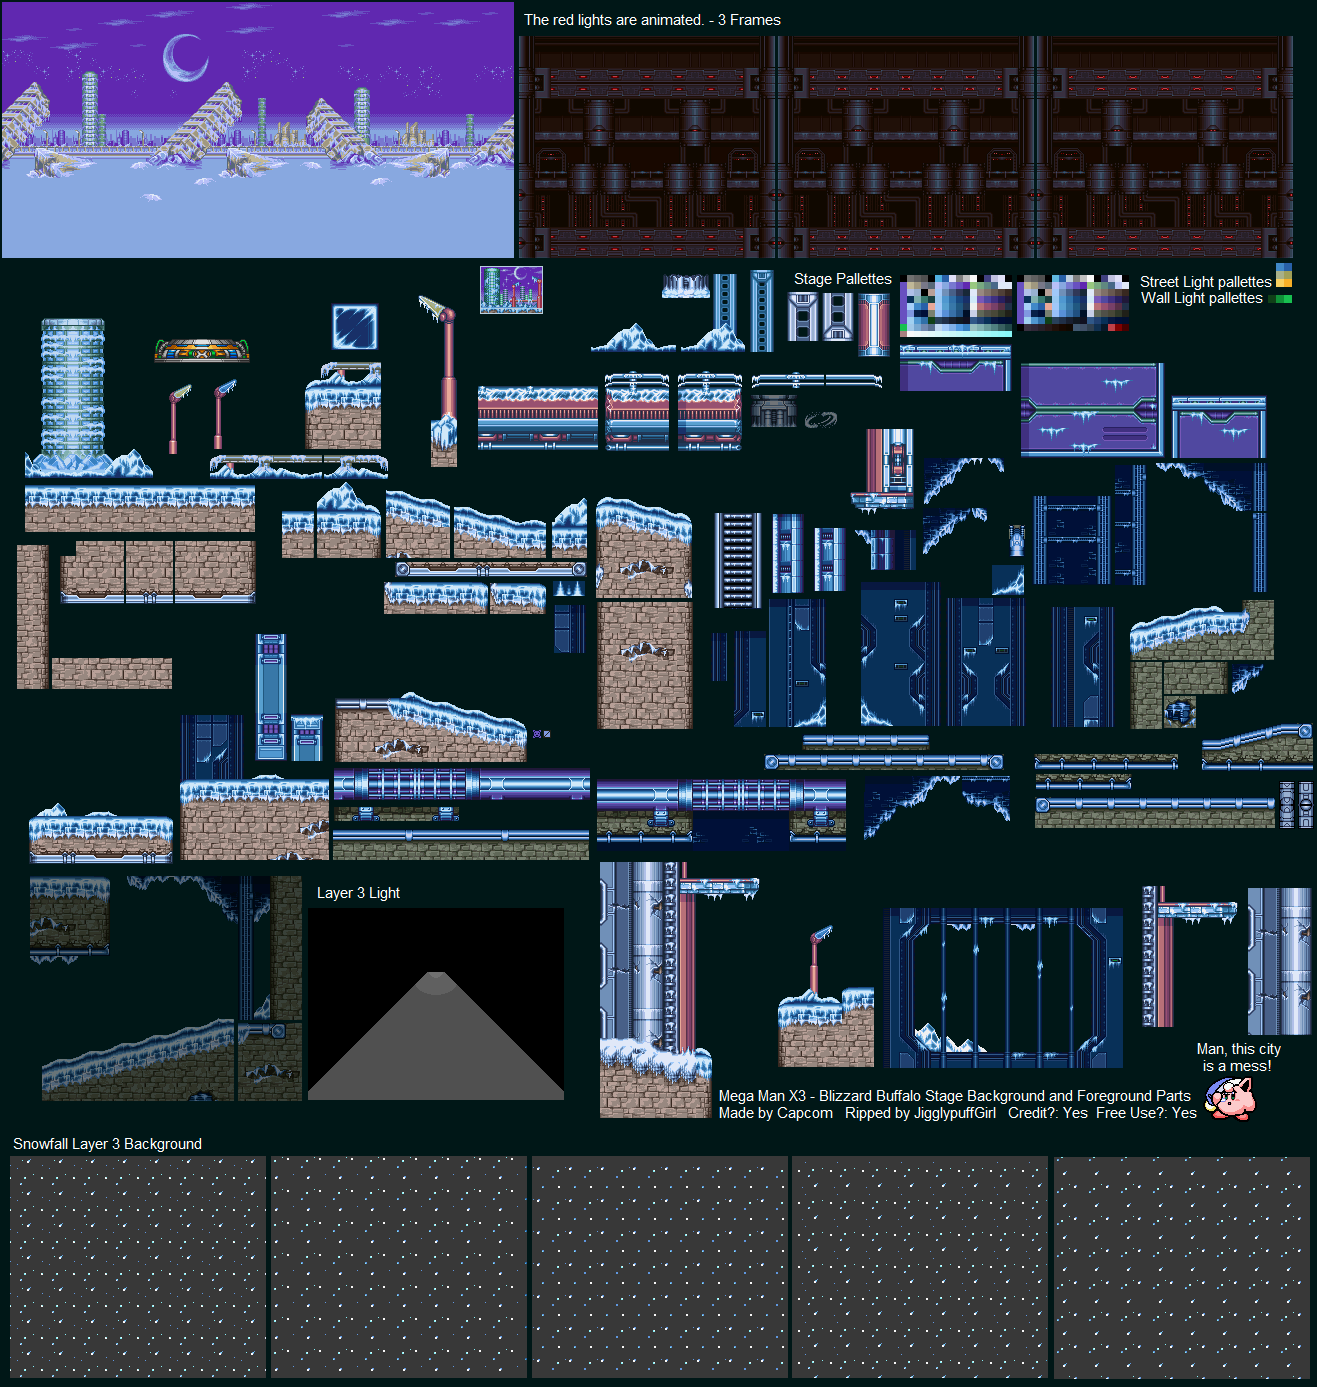 SNES - Mega Man X3 - Blizzard Buffalo Tileset - The Spriters Resource